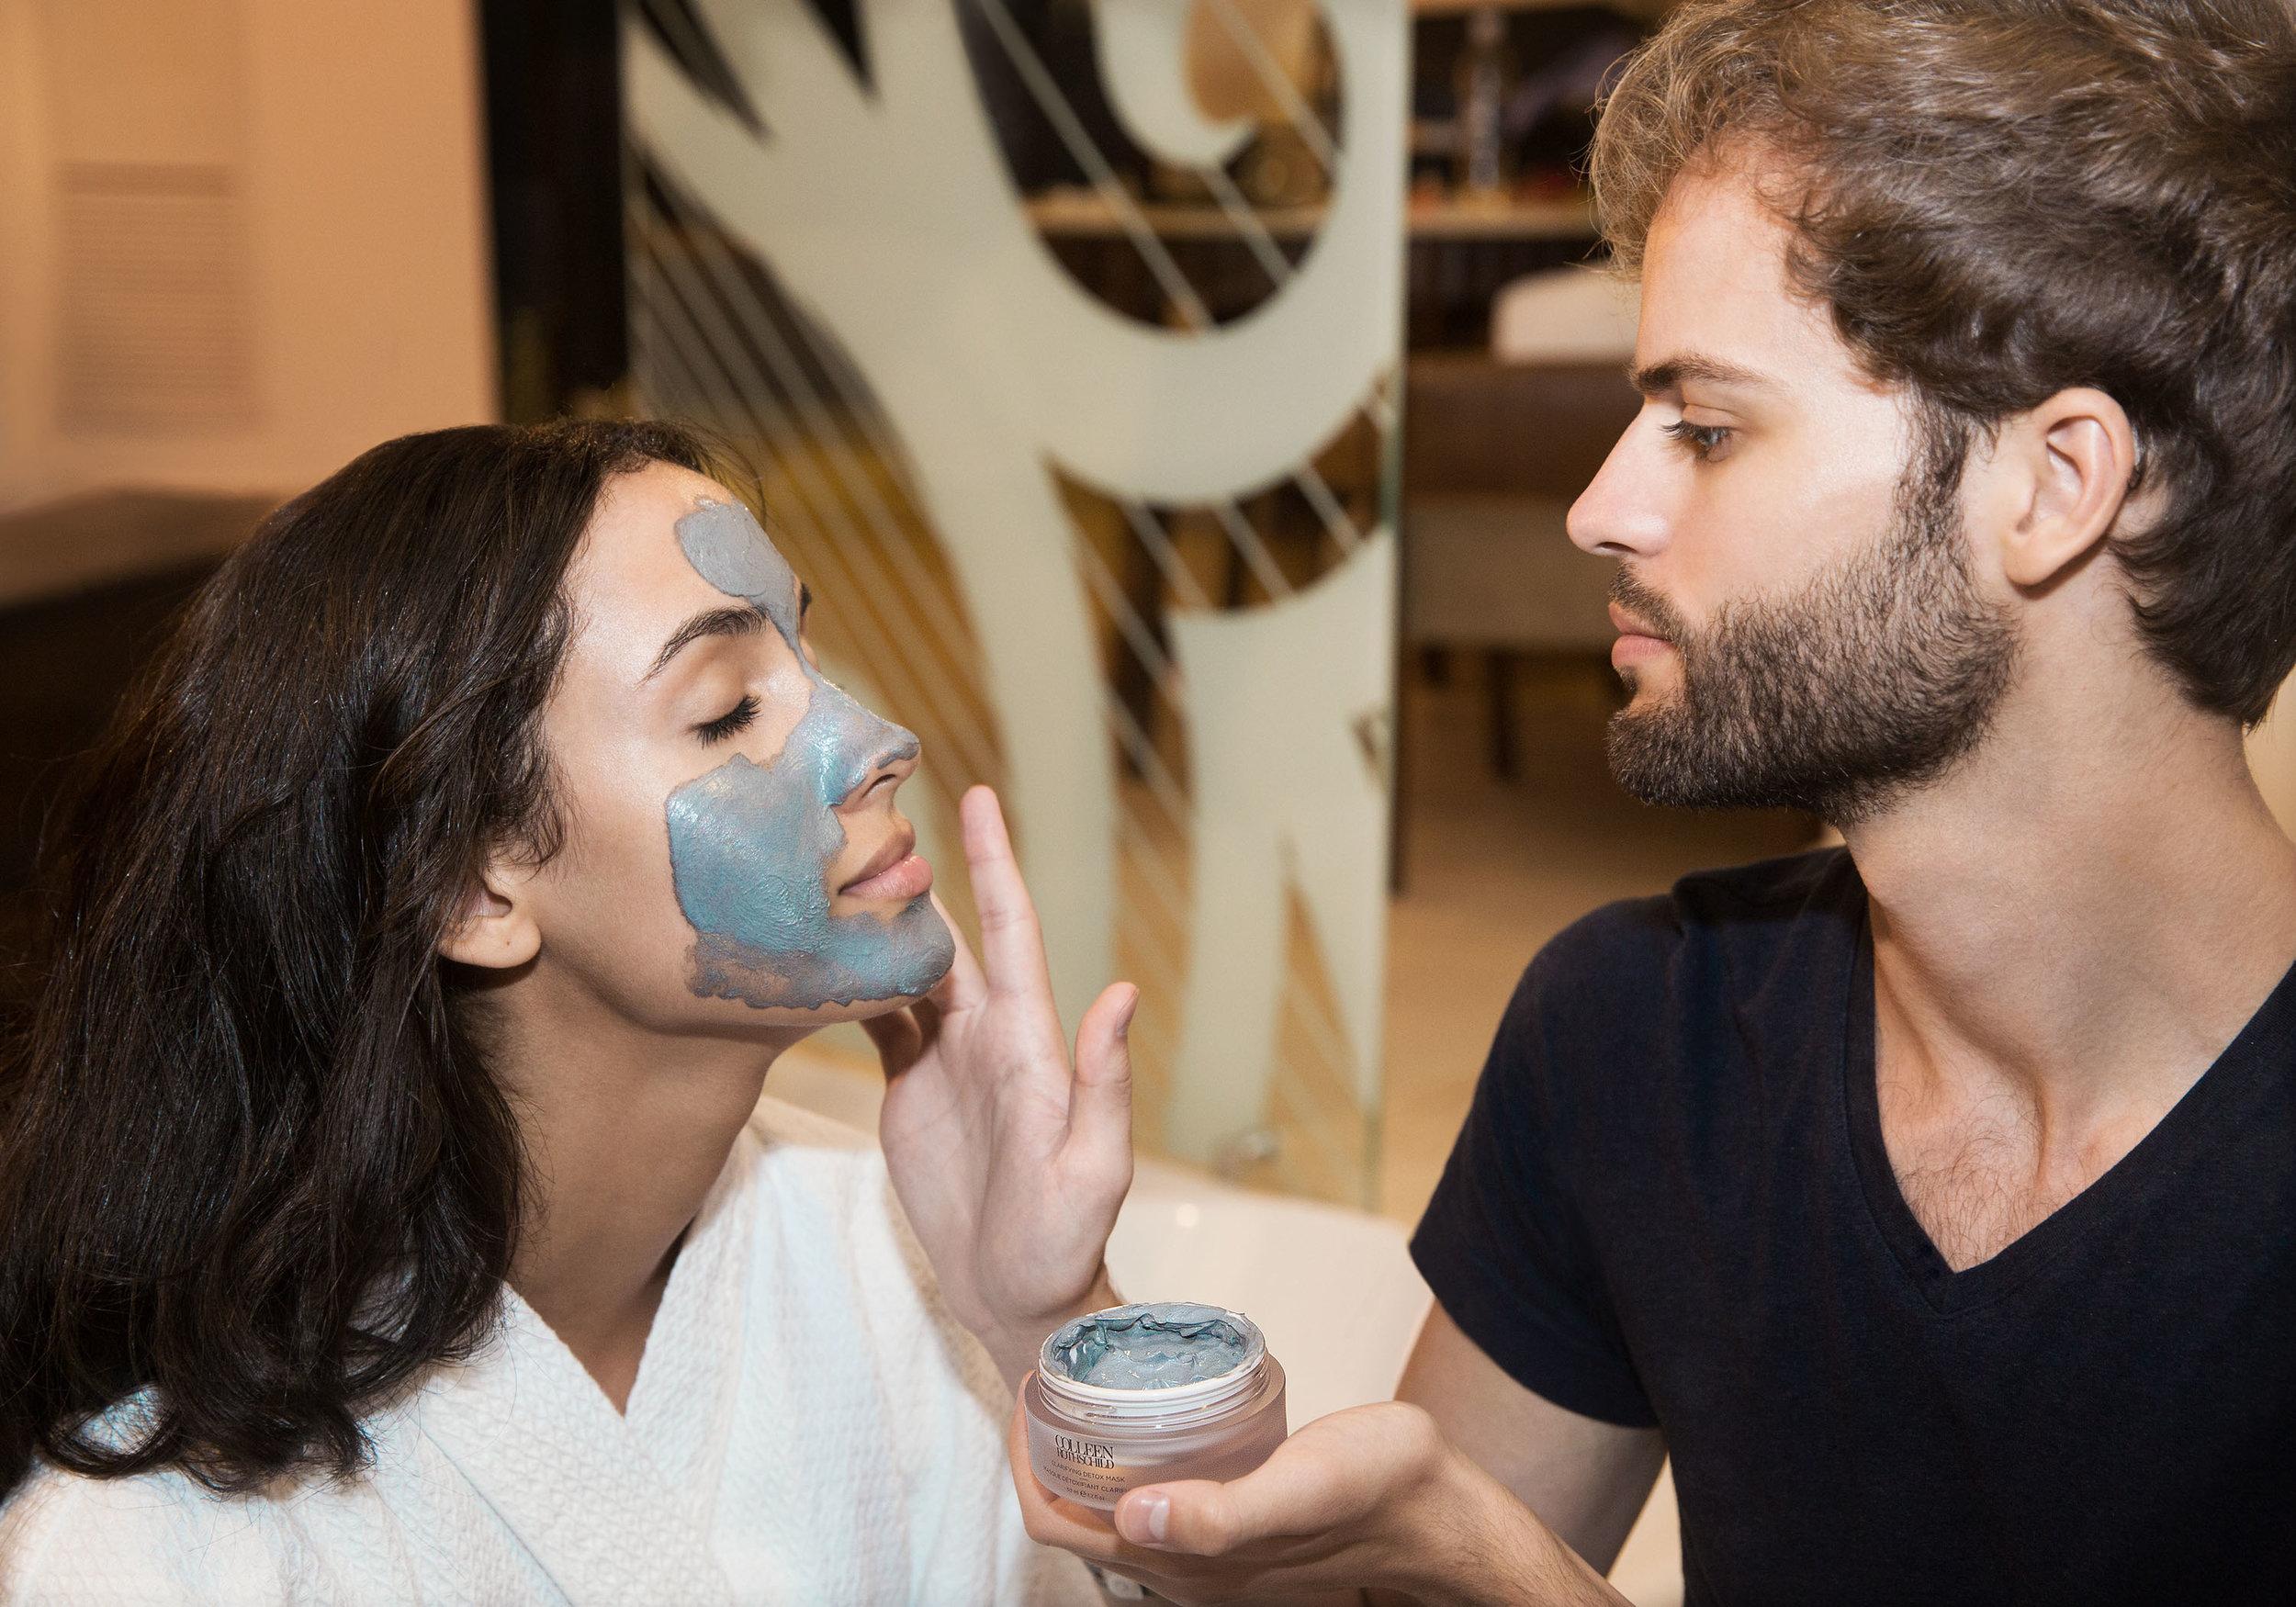 Collen-R-Mask-Veronica-And-Austen-Parker.jpg